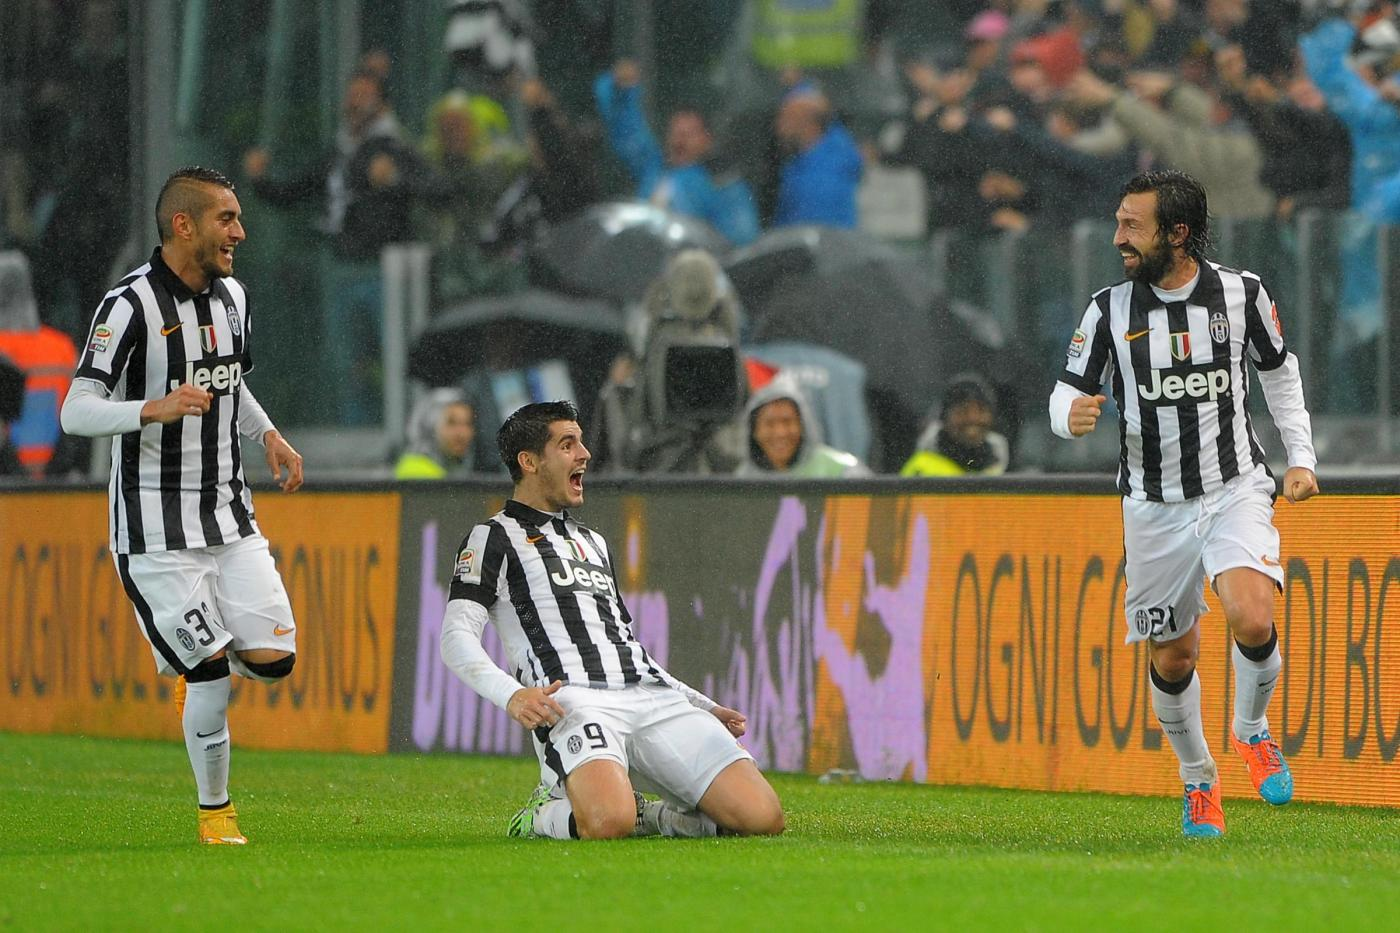 Juventus vs Torino 2-1: decide Pirlo all'ultimo respiro